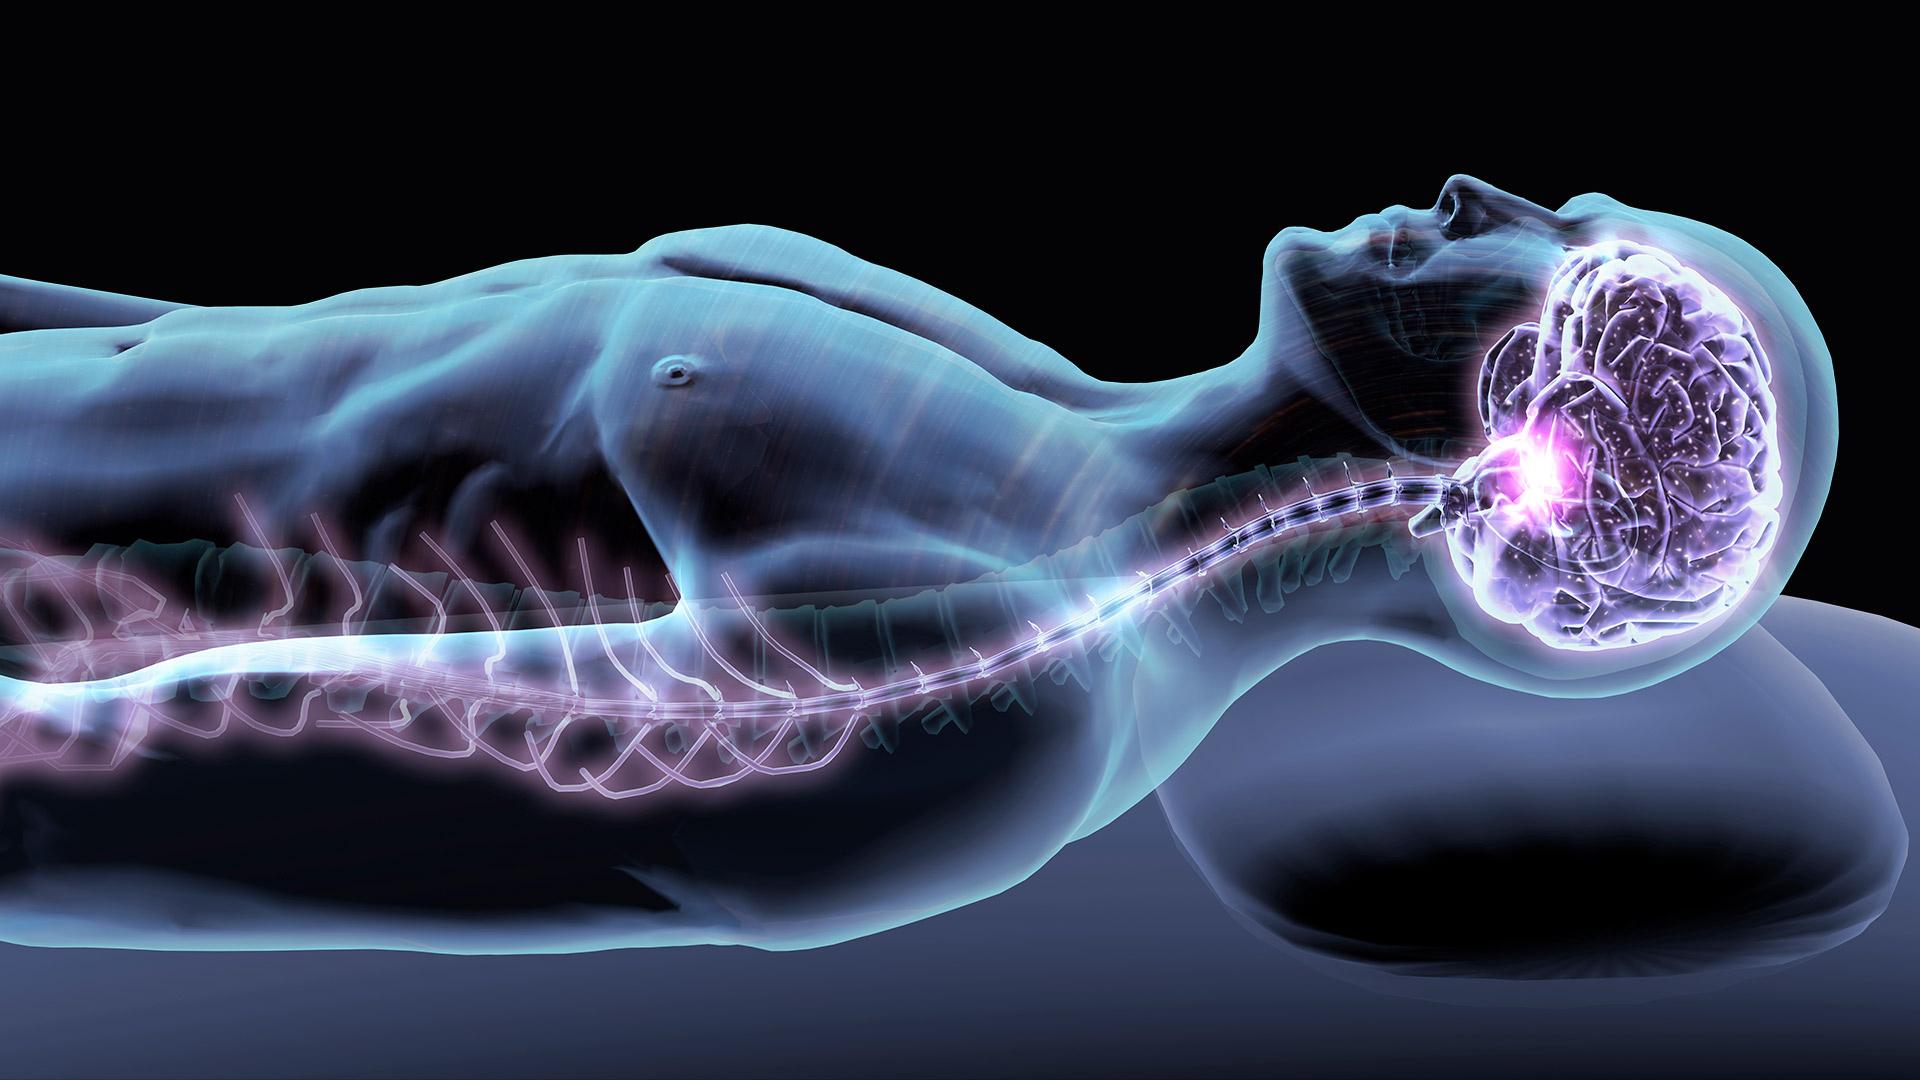 UMD-UMB Study Examines Link Between Spine Injury and Cognitive Decline